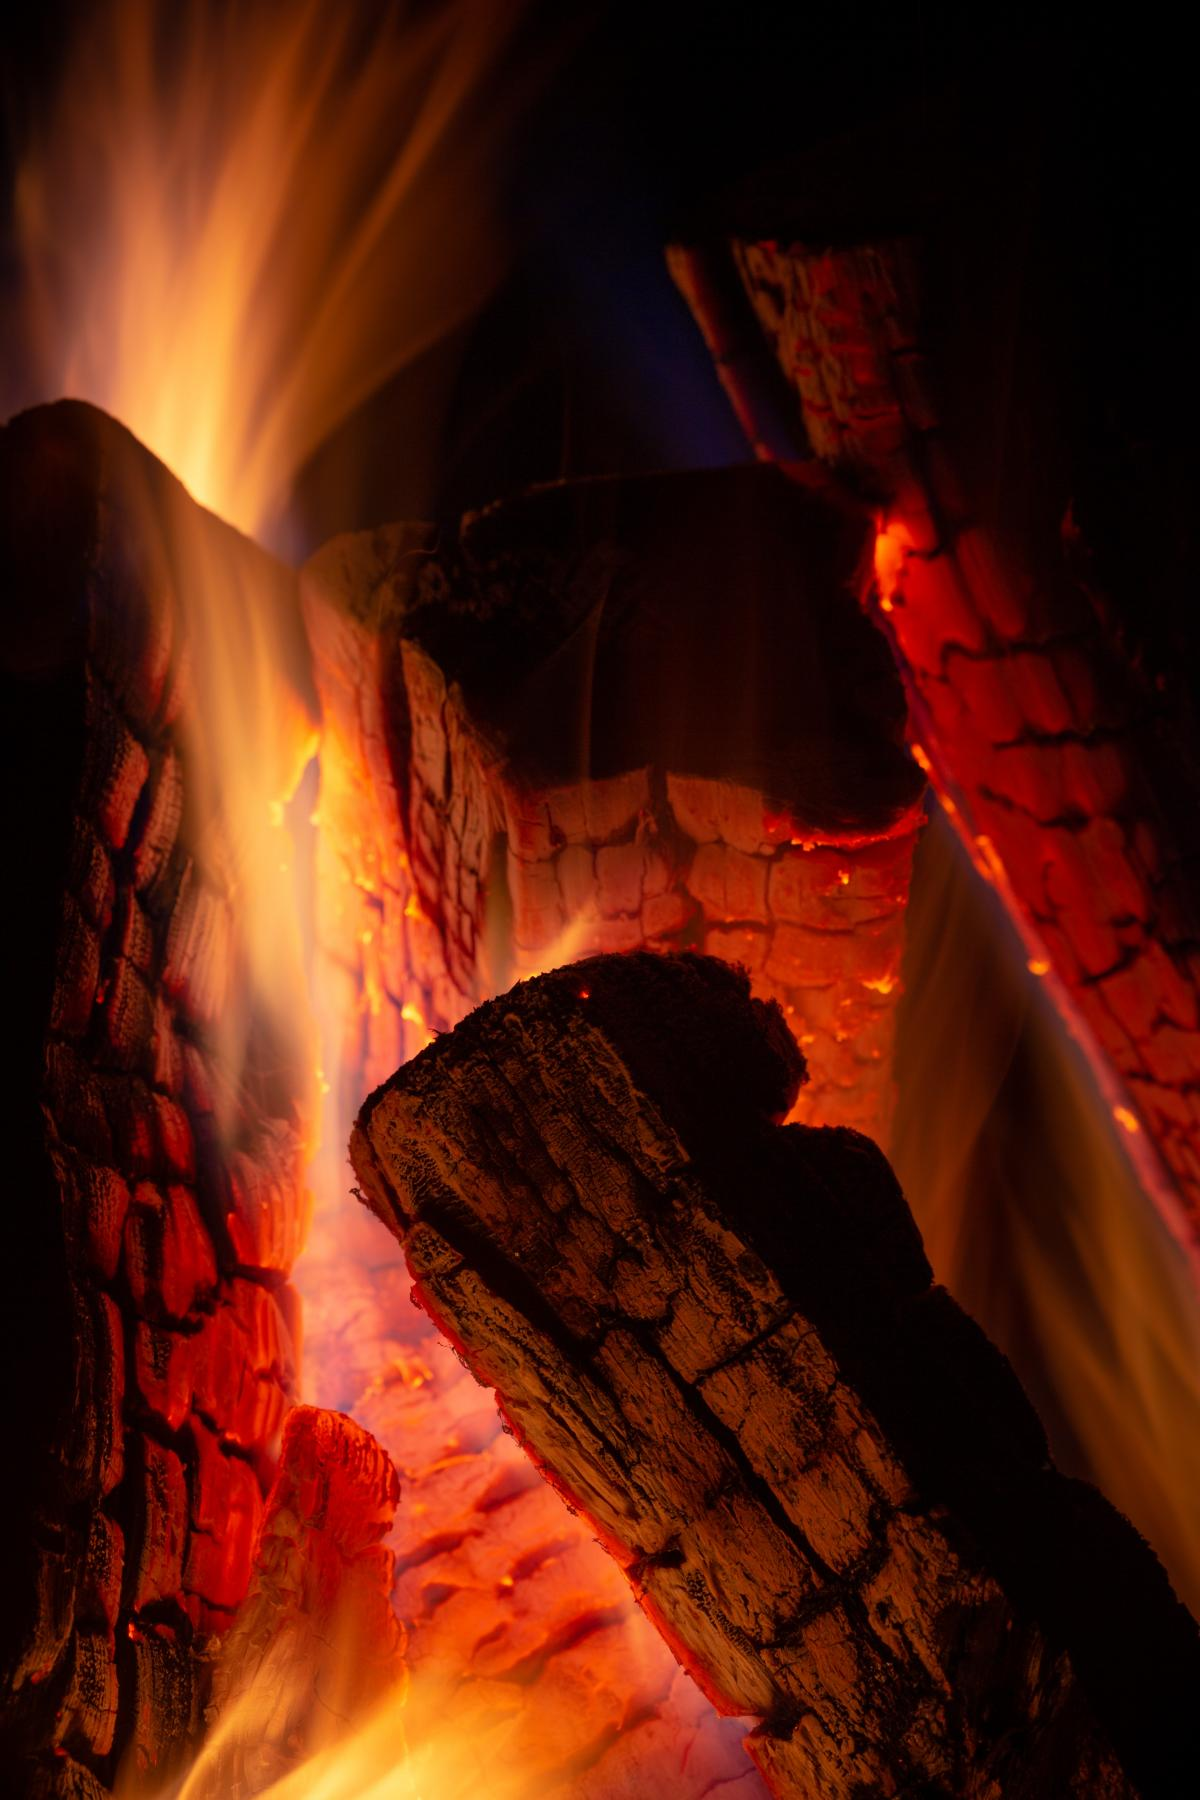 Fireplace Fire Flame